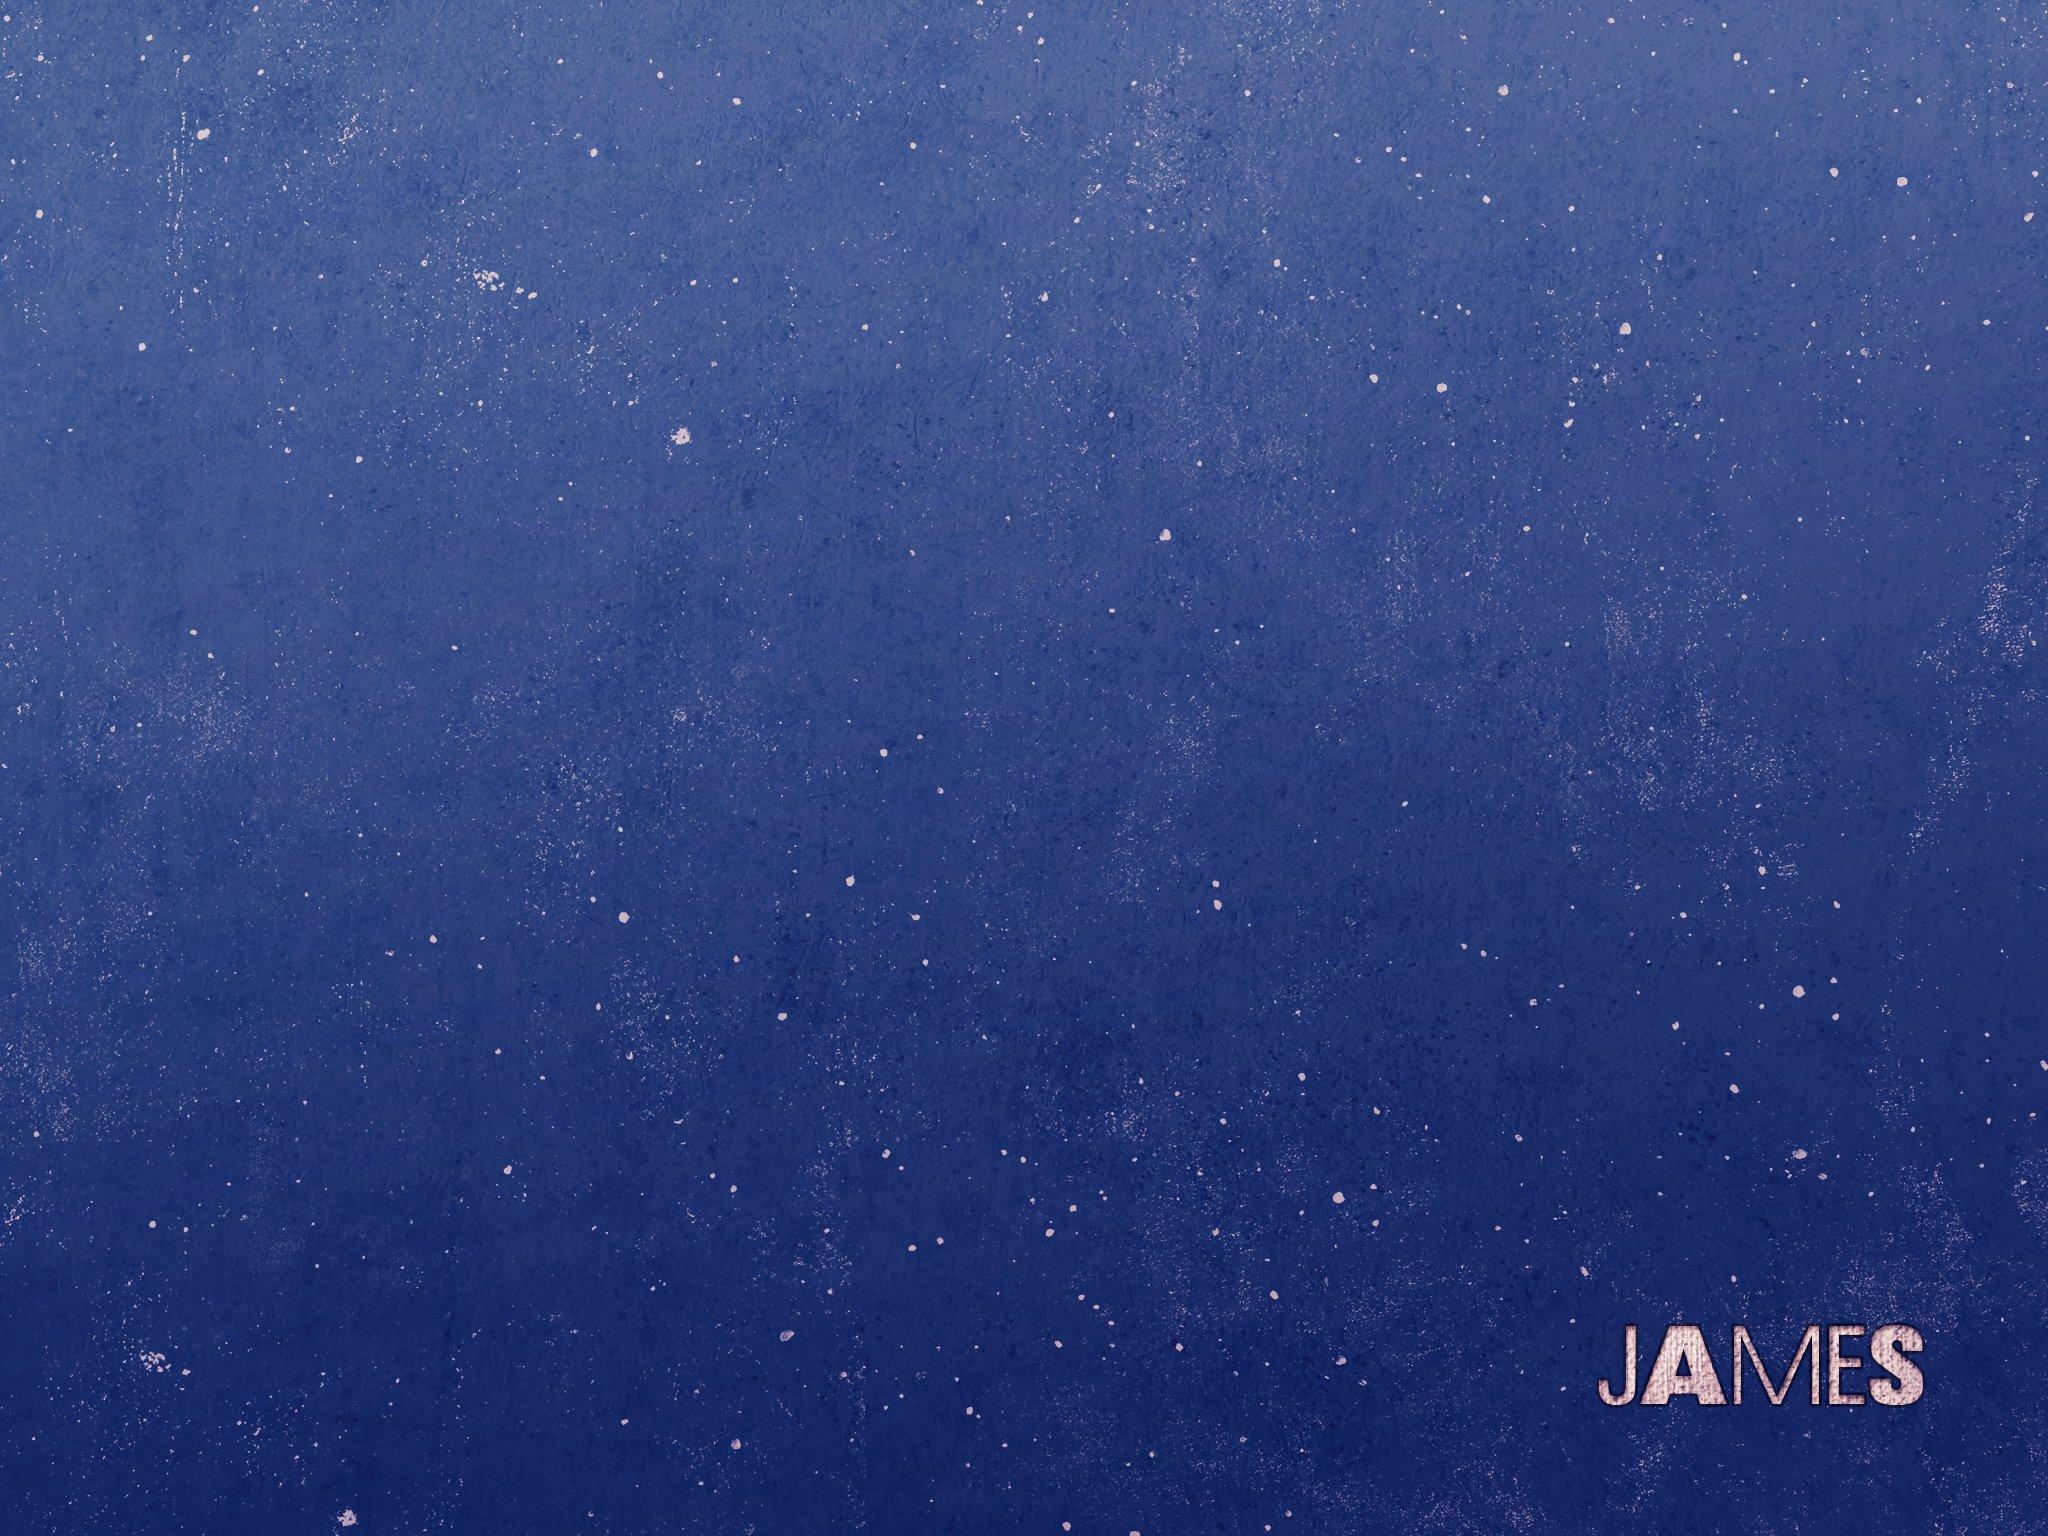 59-James_Secondary_4x3-fullscreen.jpg